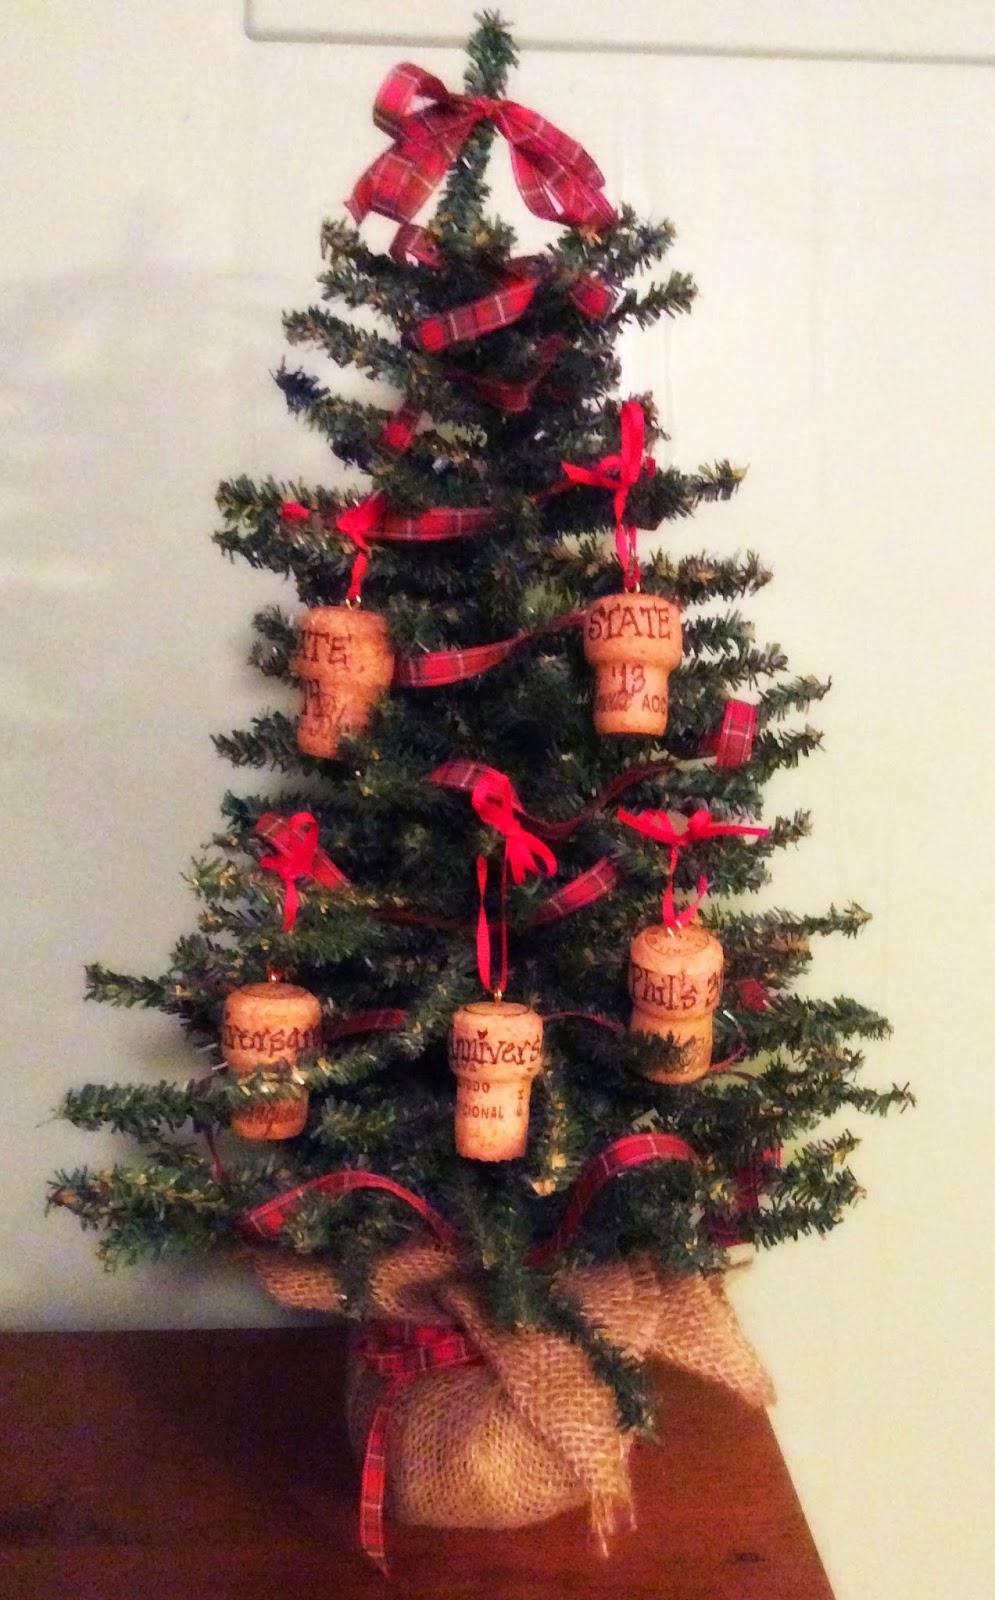 The Happy Little Hive: Champagne Cork Ornaments